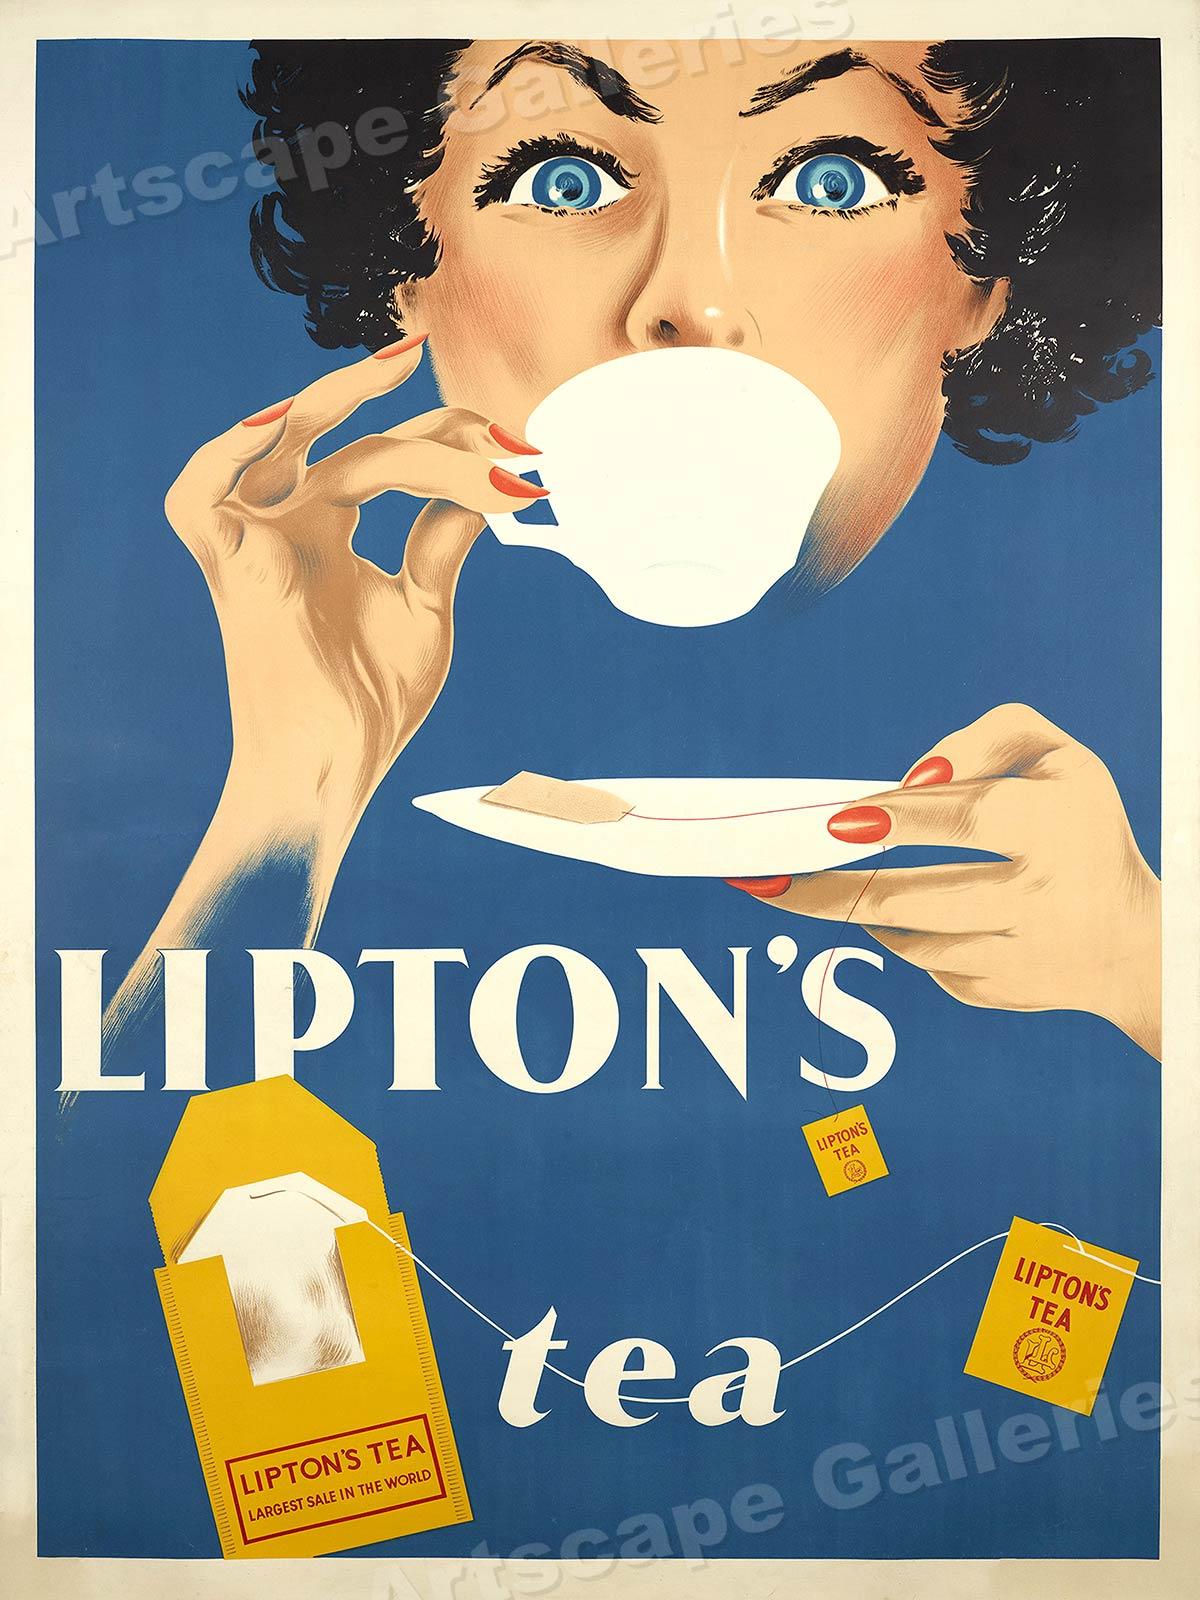 1950s Lipton Tea Bag Vintage Style Advertising Poster